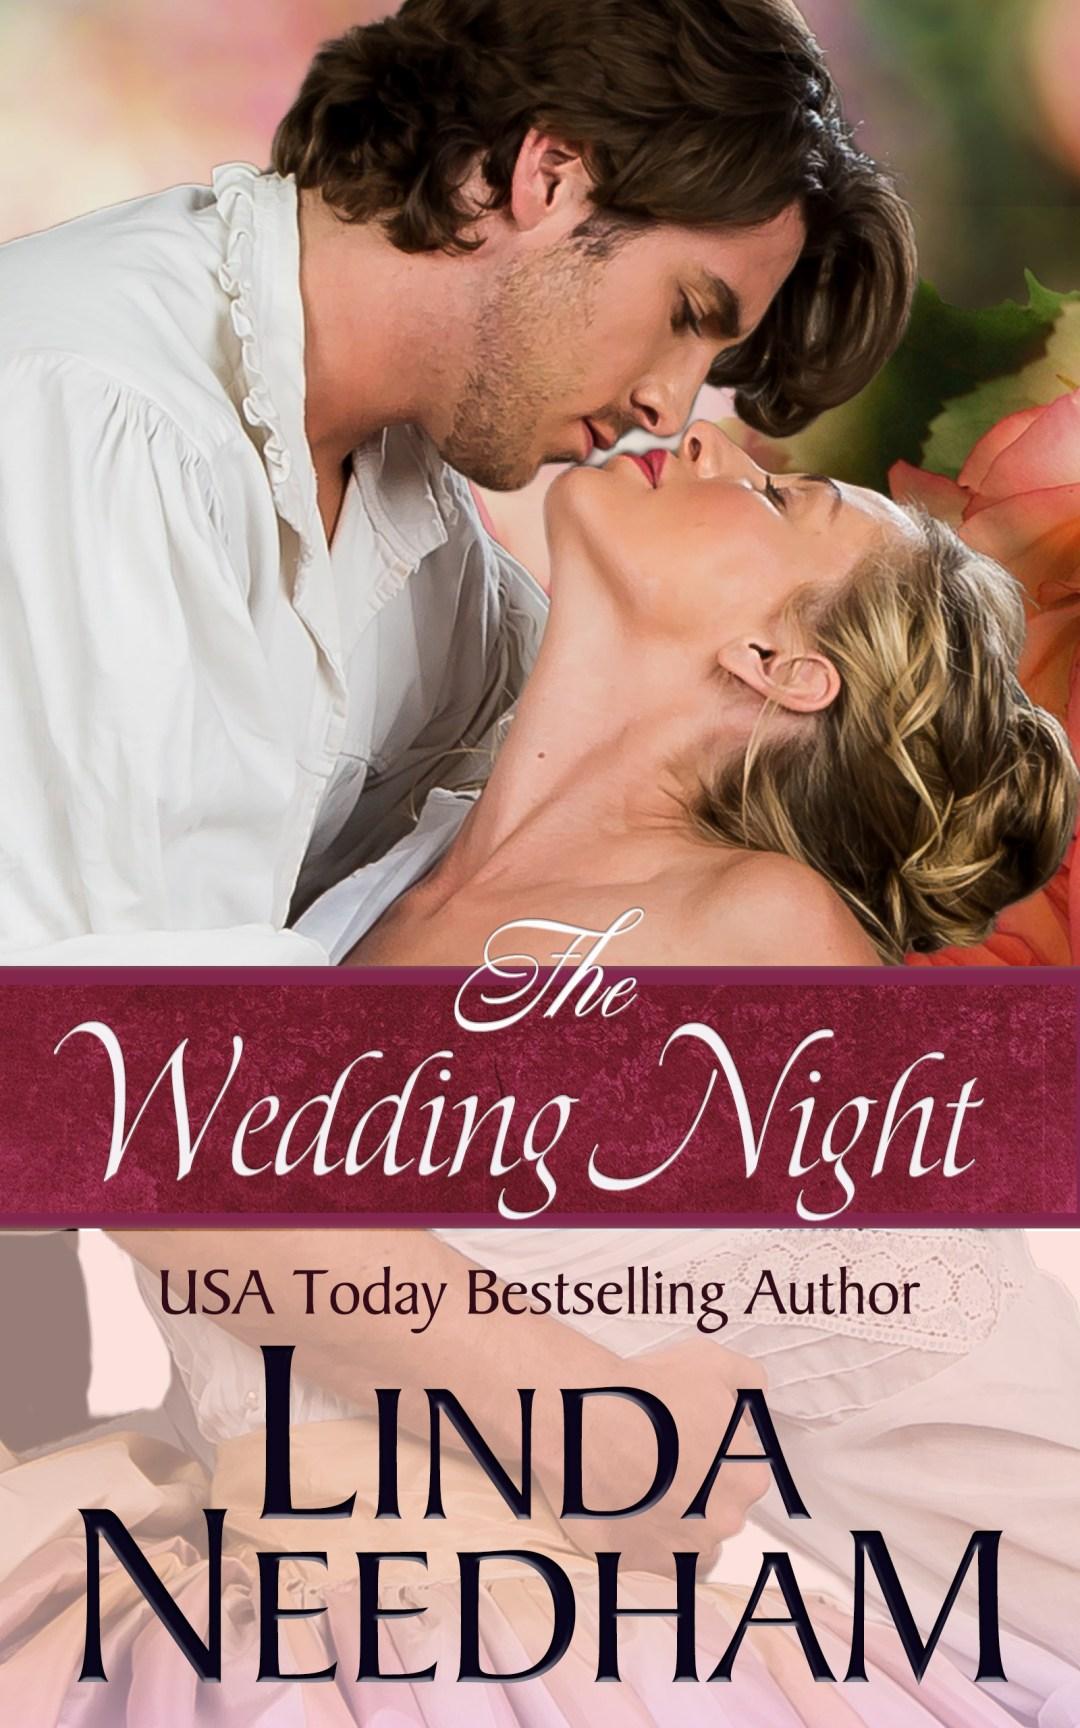 Book Cover -- The Wedding Night by Linda Needham